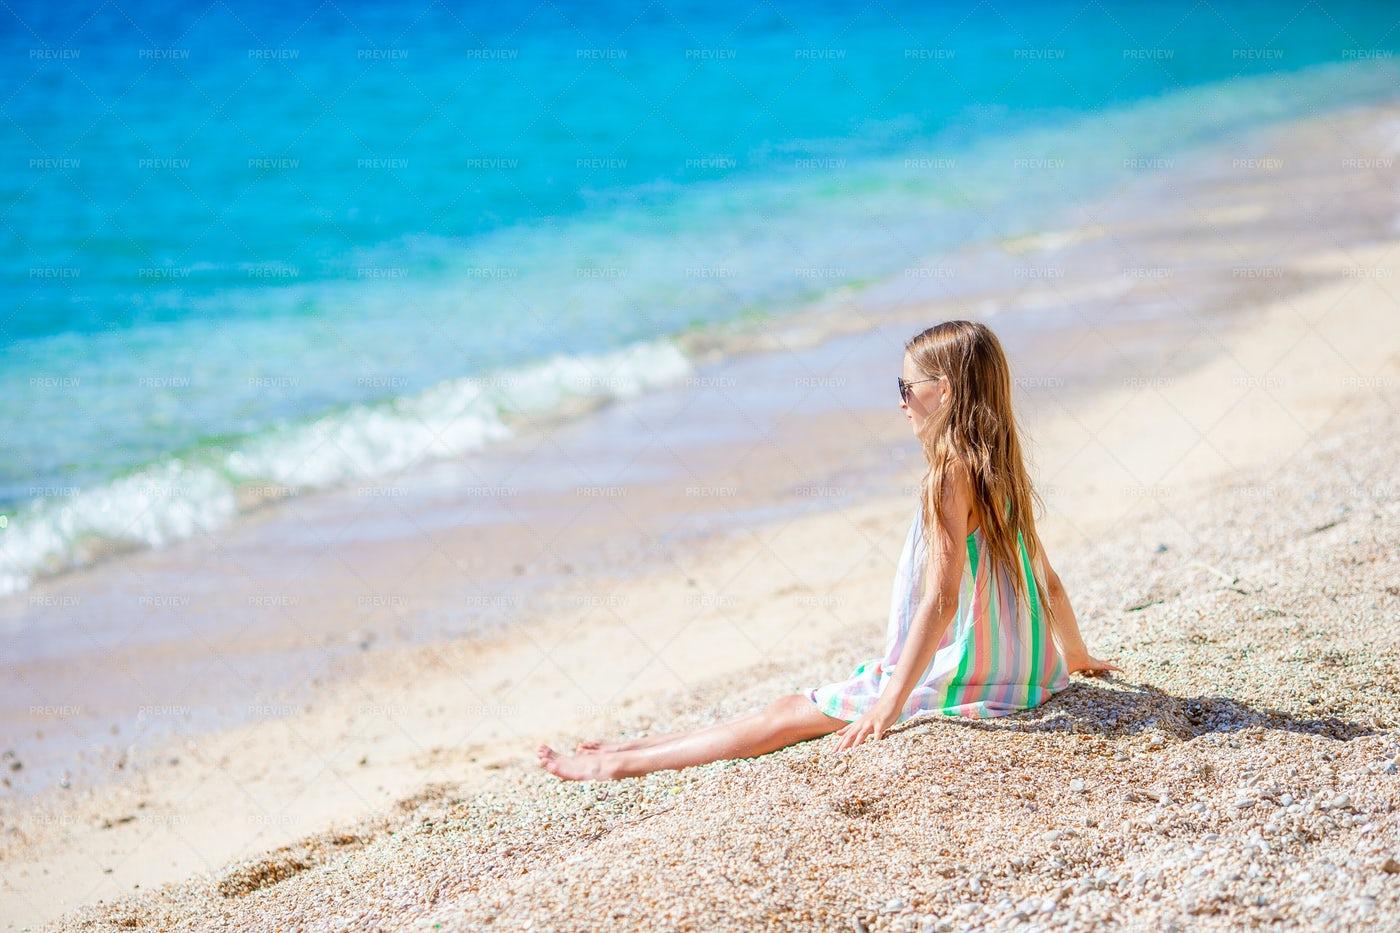 Little Girl Observing The Beach: Stock Photos